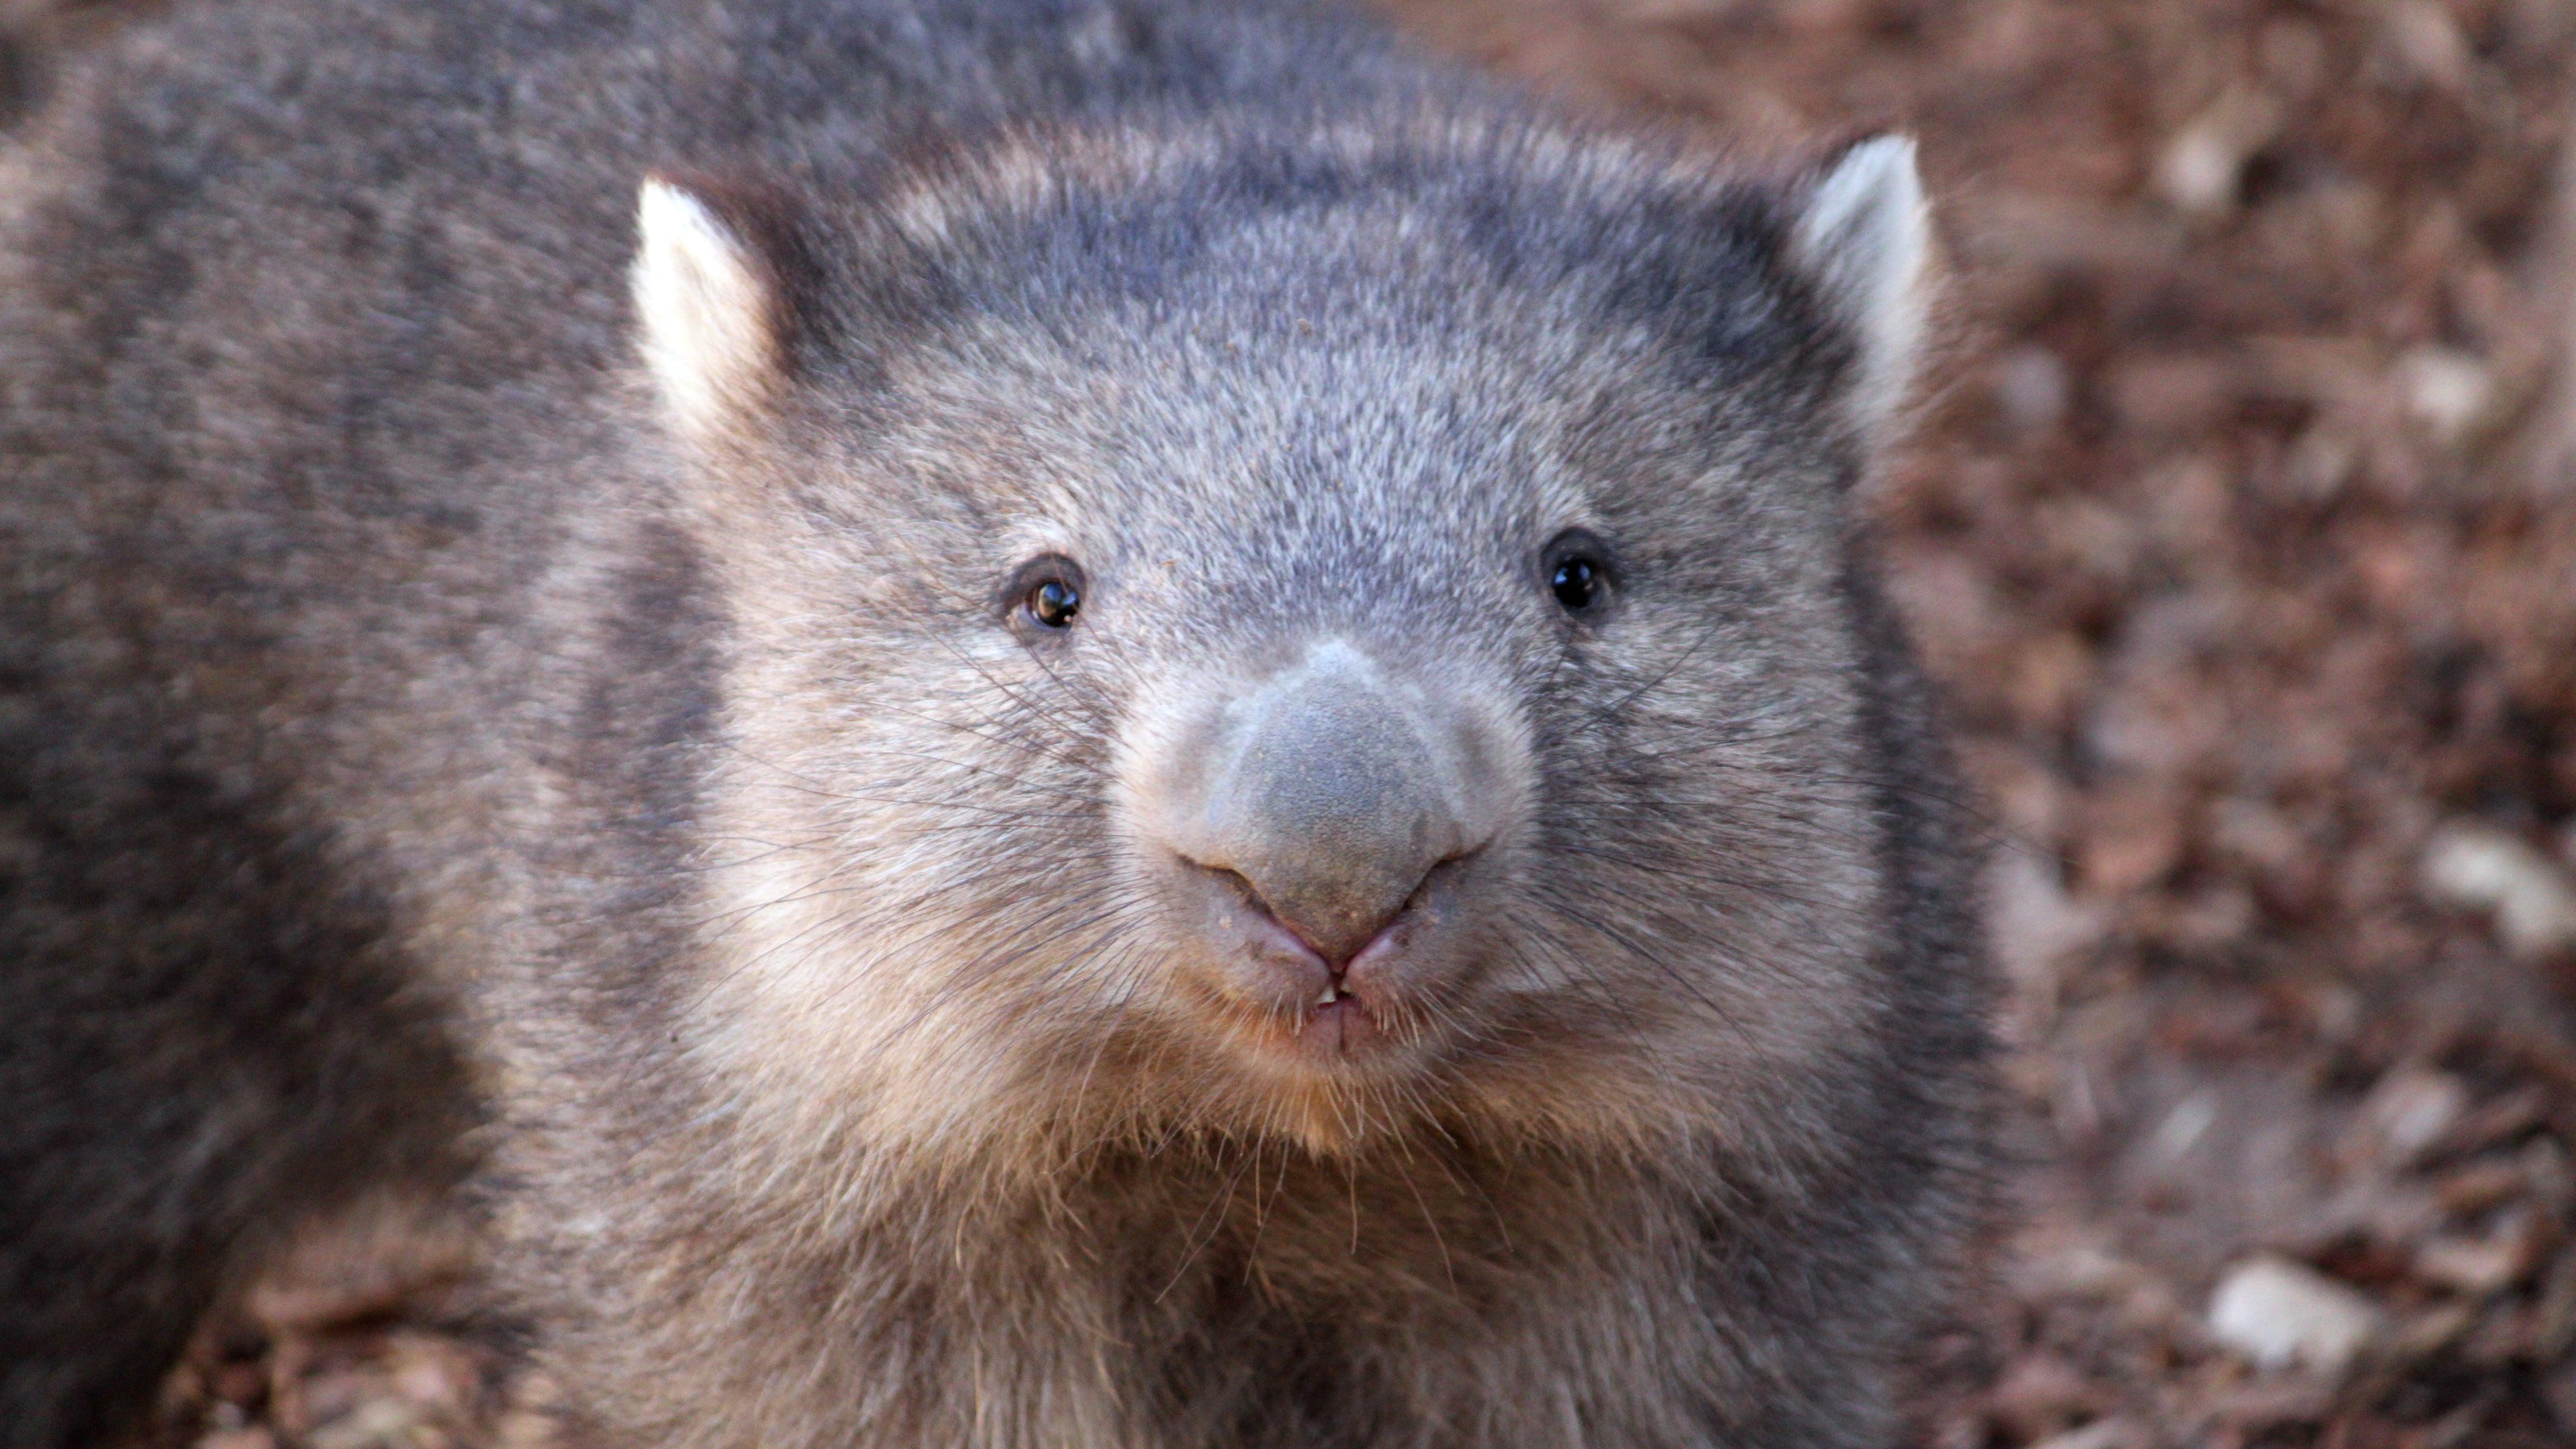 cubic-poop fluid-dynamics poop wombats